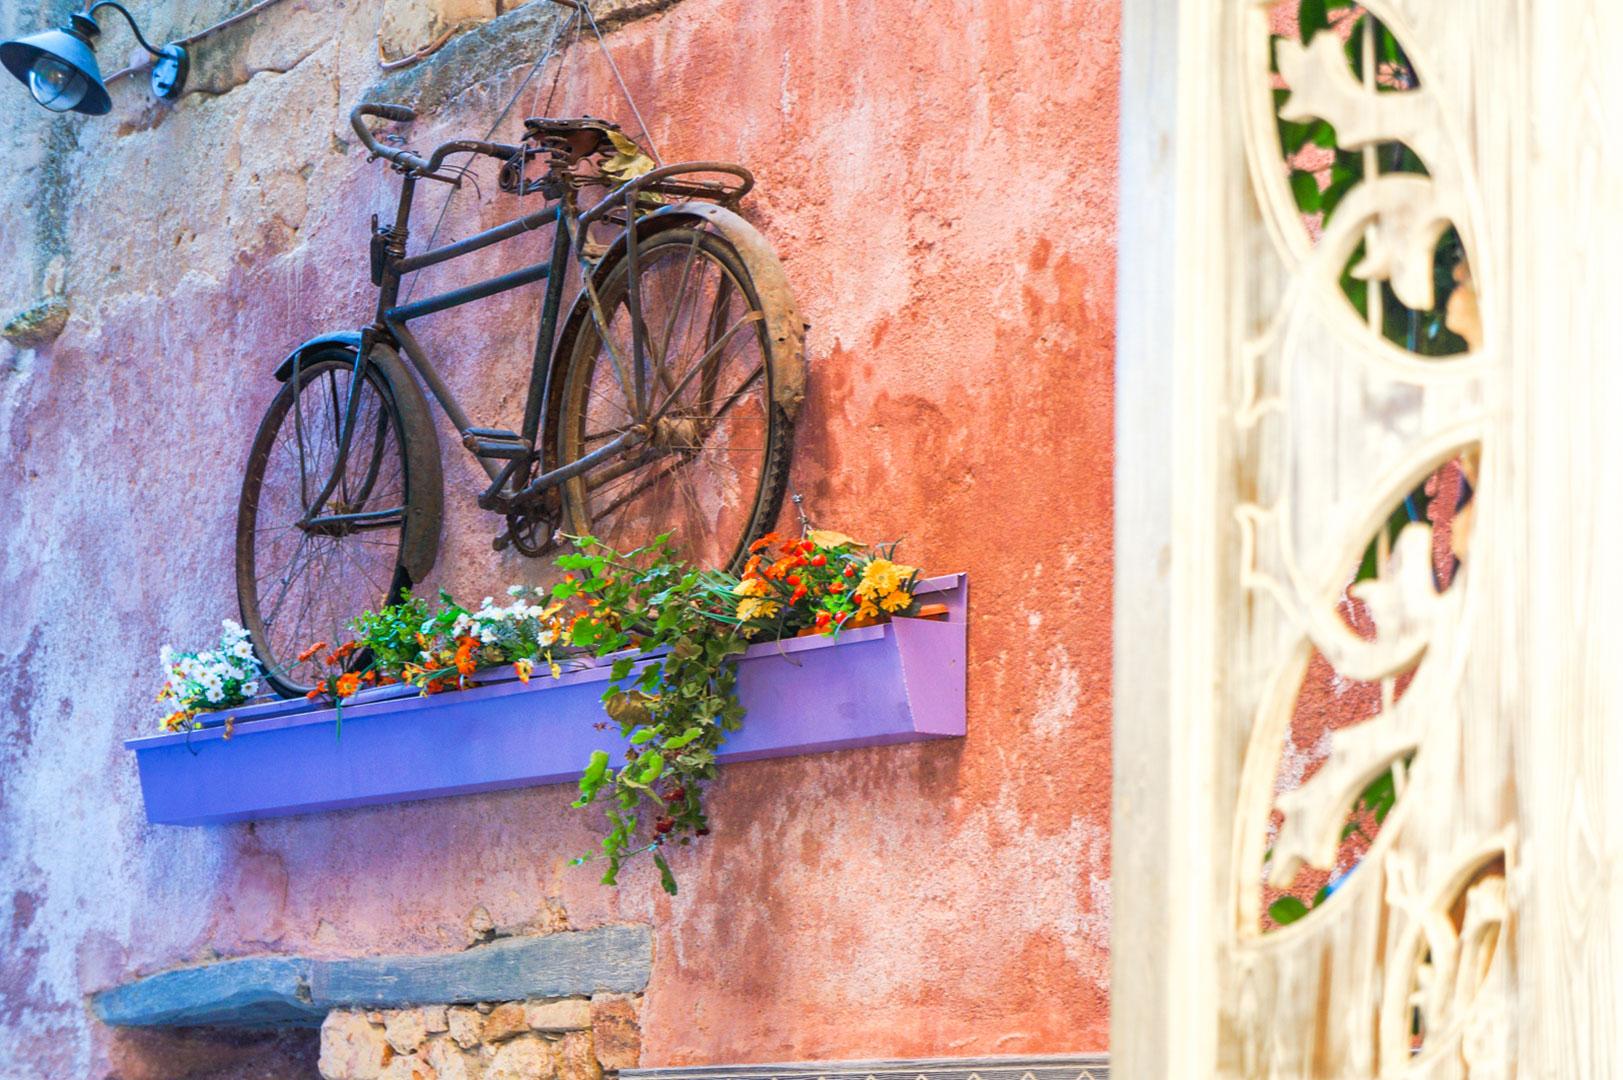 chania-crete-greece-la-vie-en-blog-all-rights-reserved-22